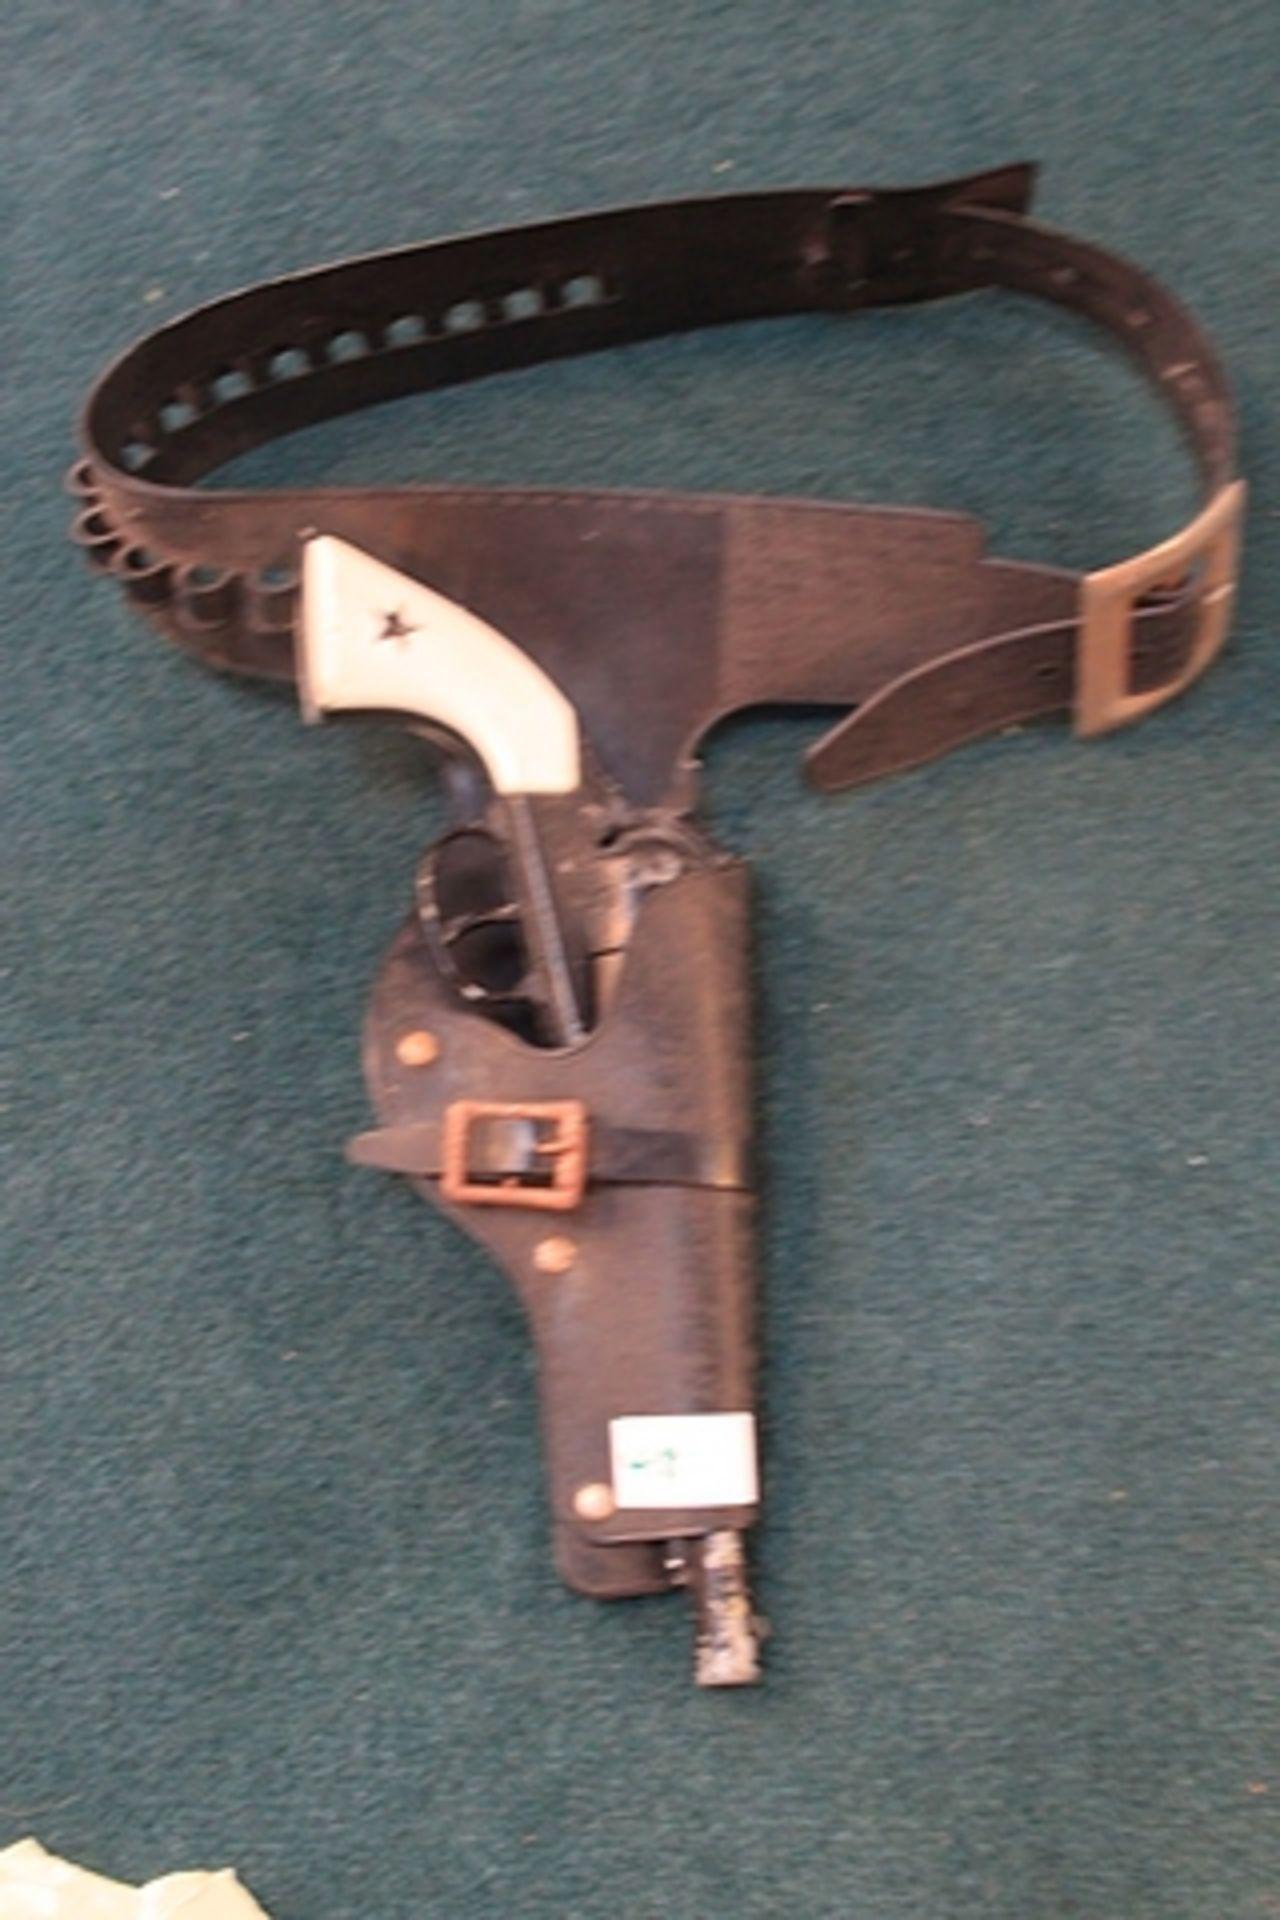 Lot 418 - Lone Star Apache Cap Gun With Holster